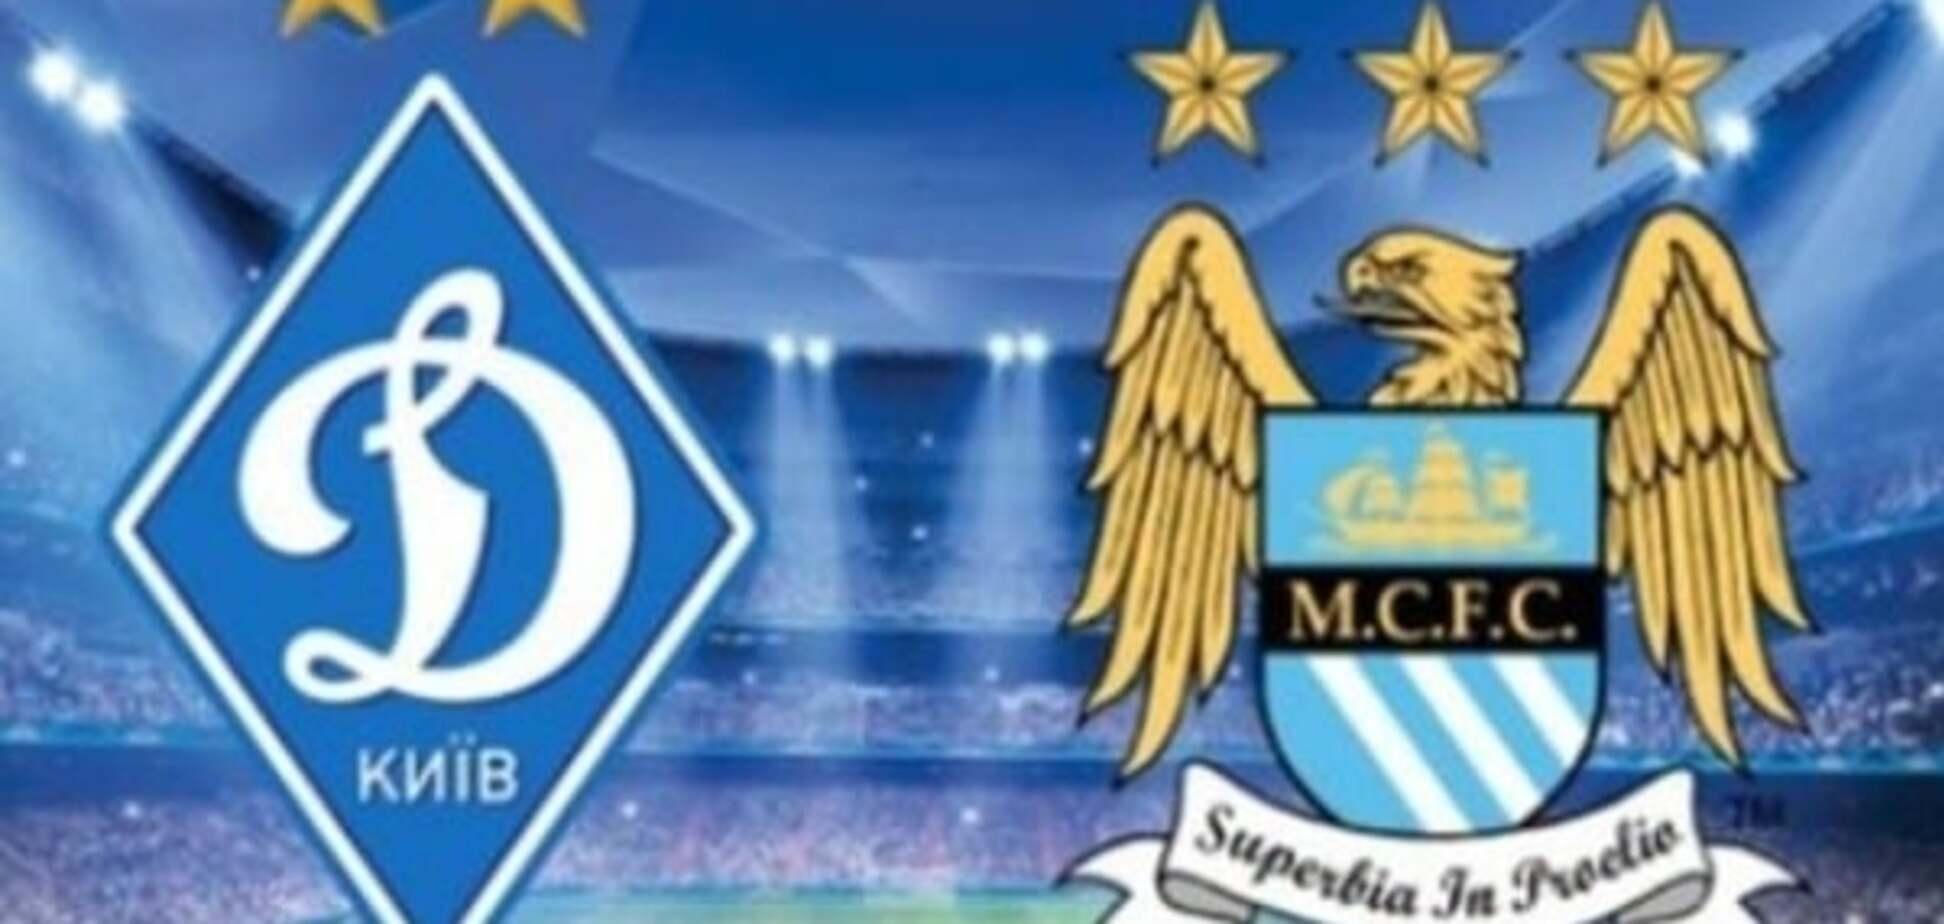 Динамо - Манчестер Сити: прогноз экспертов